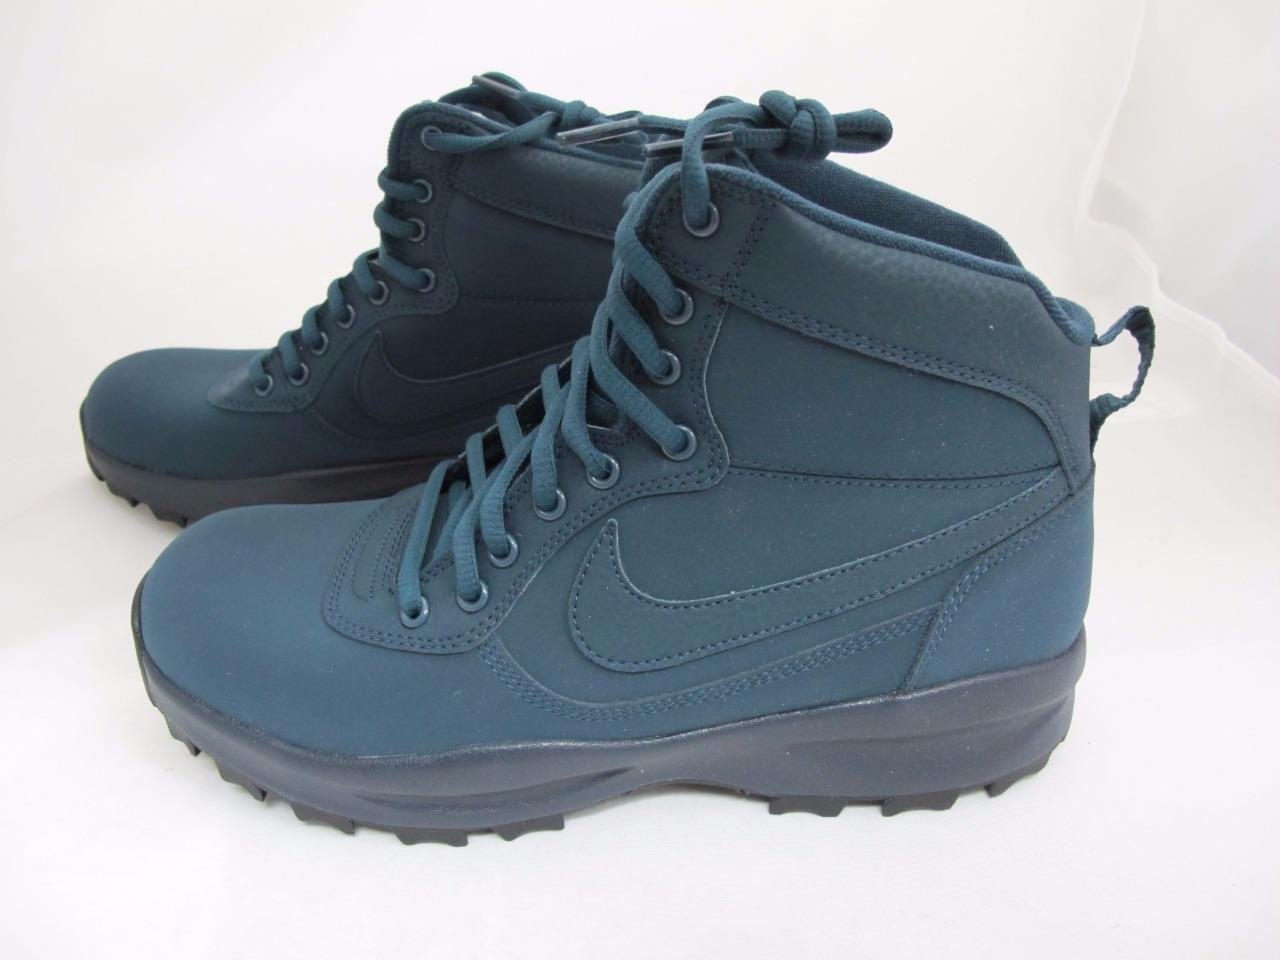 Nuevo Para Hombre Nike Nike Hombre manoadome 844358-401 78c468